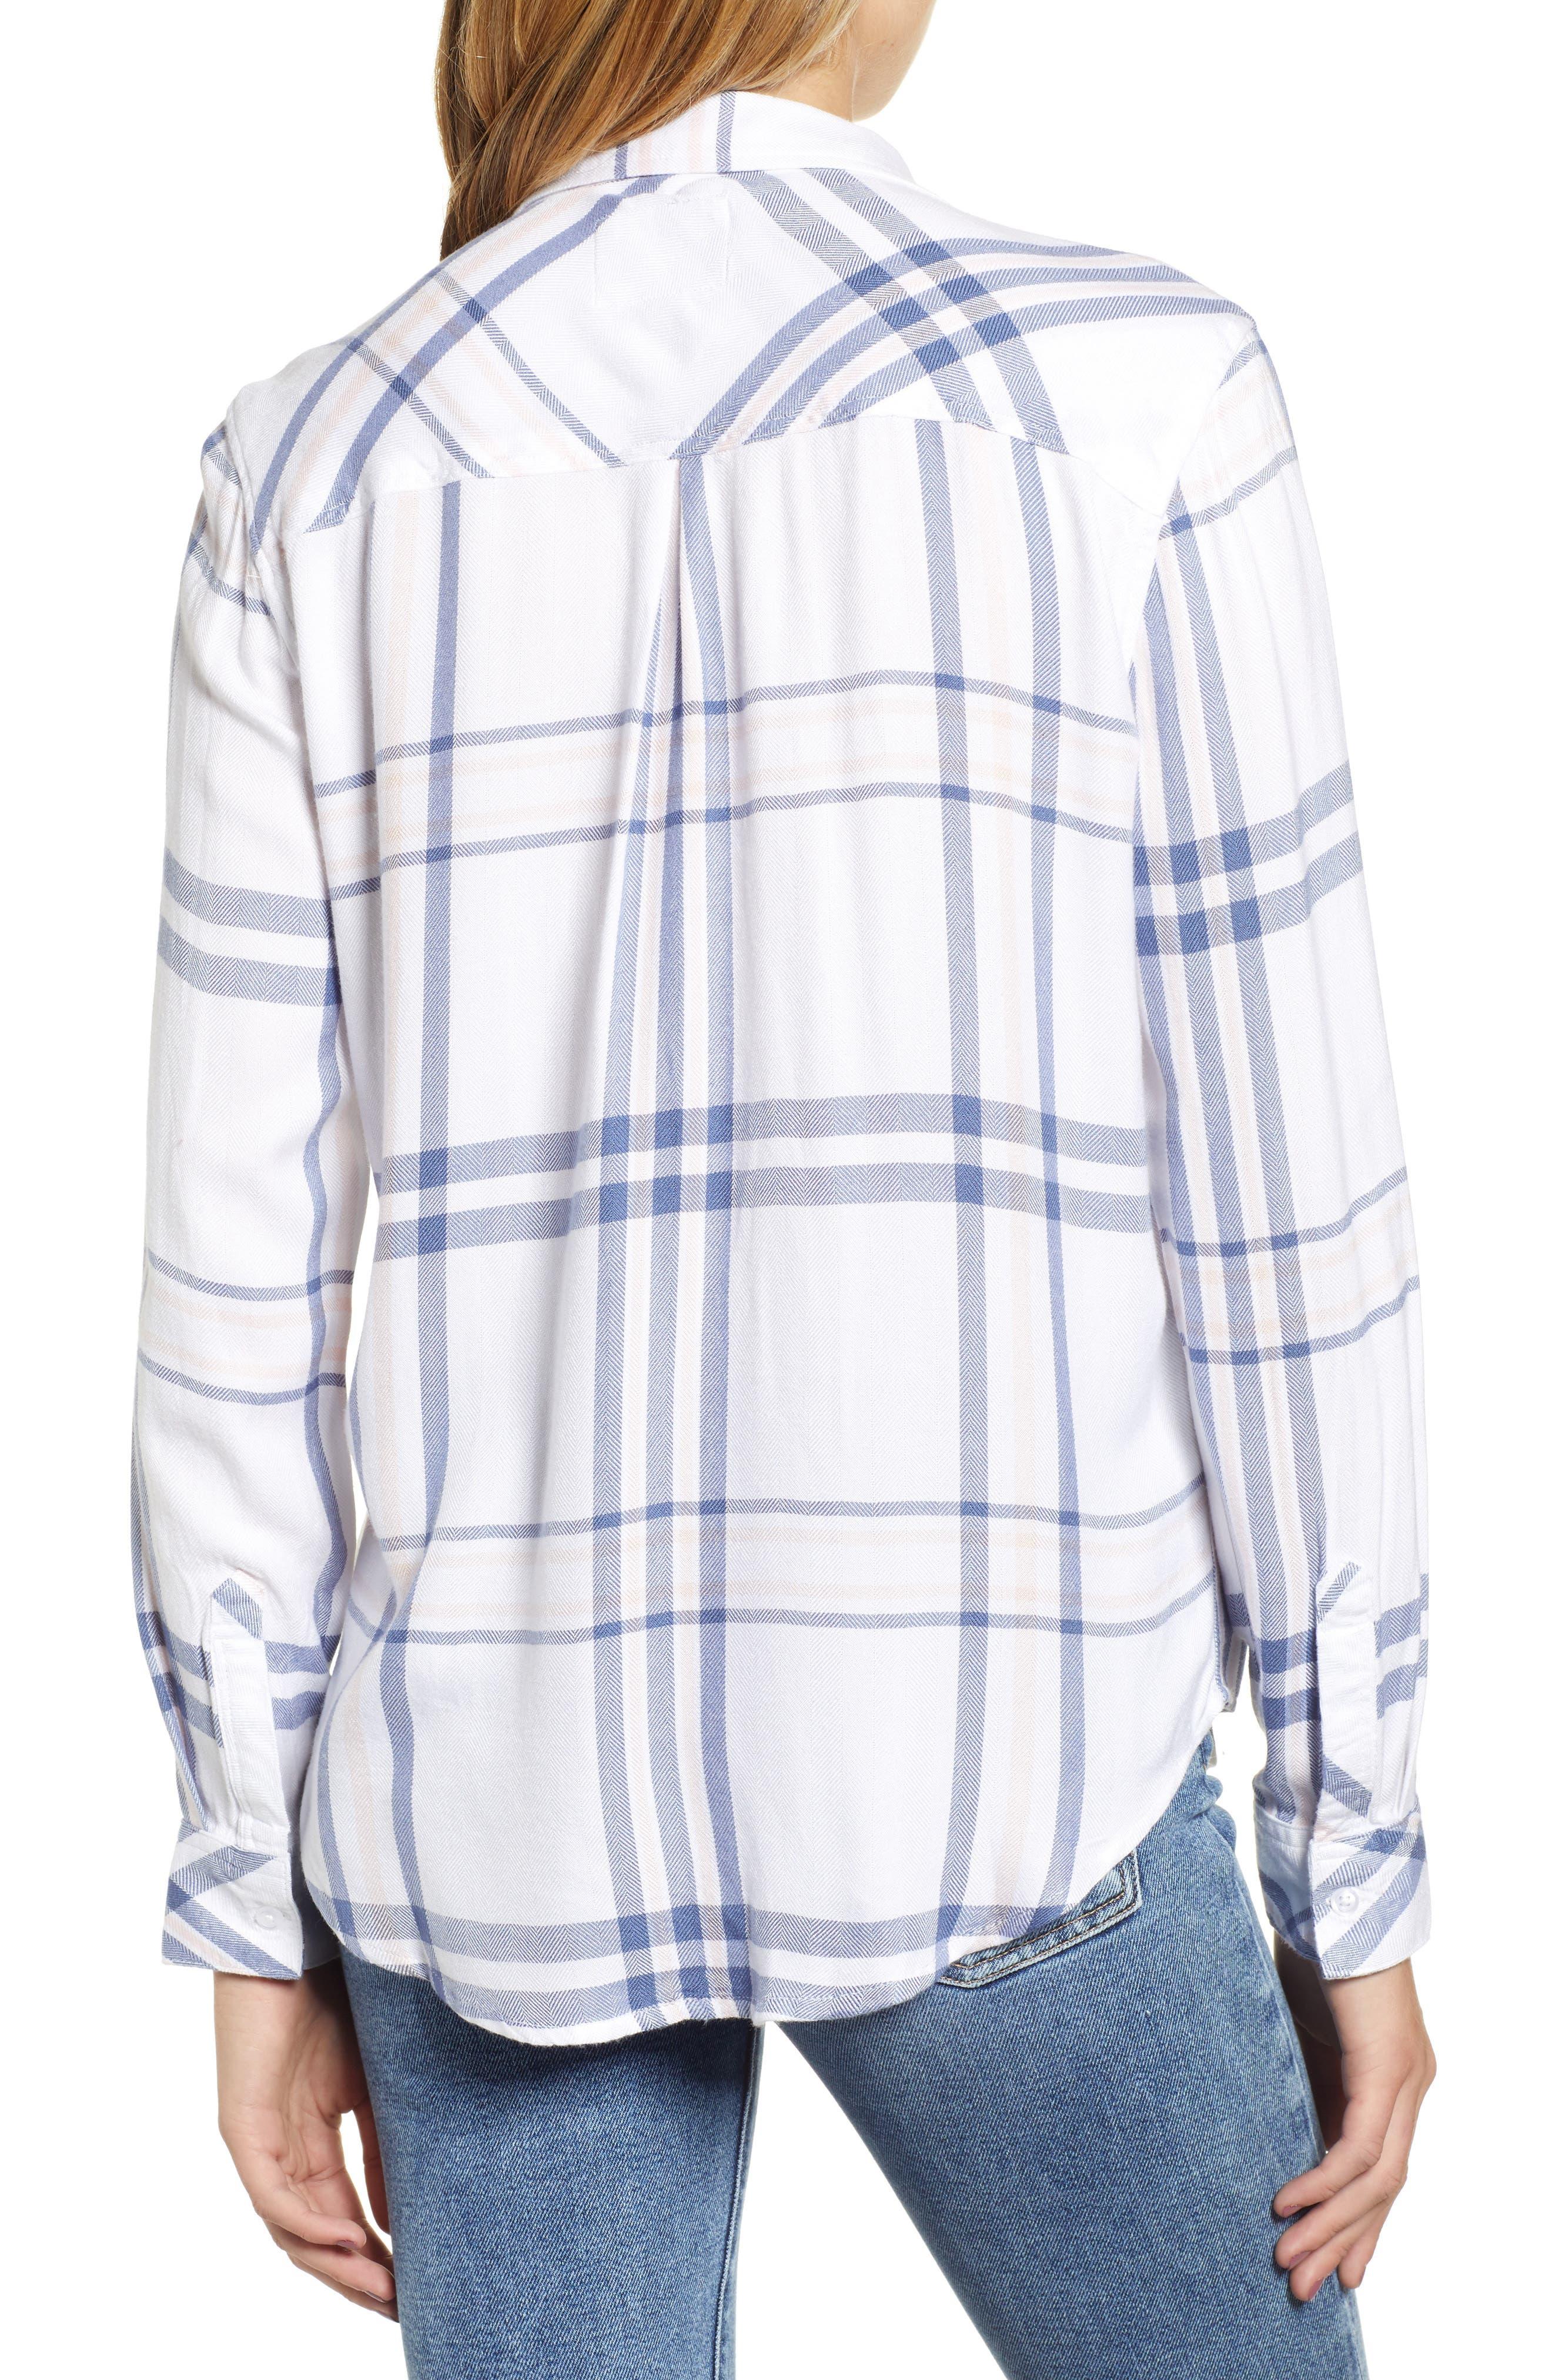 Hunter Plaid Shirt,                             Alternate thumbnail 2, color,                             INDIGO POWDER BLUSH